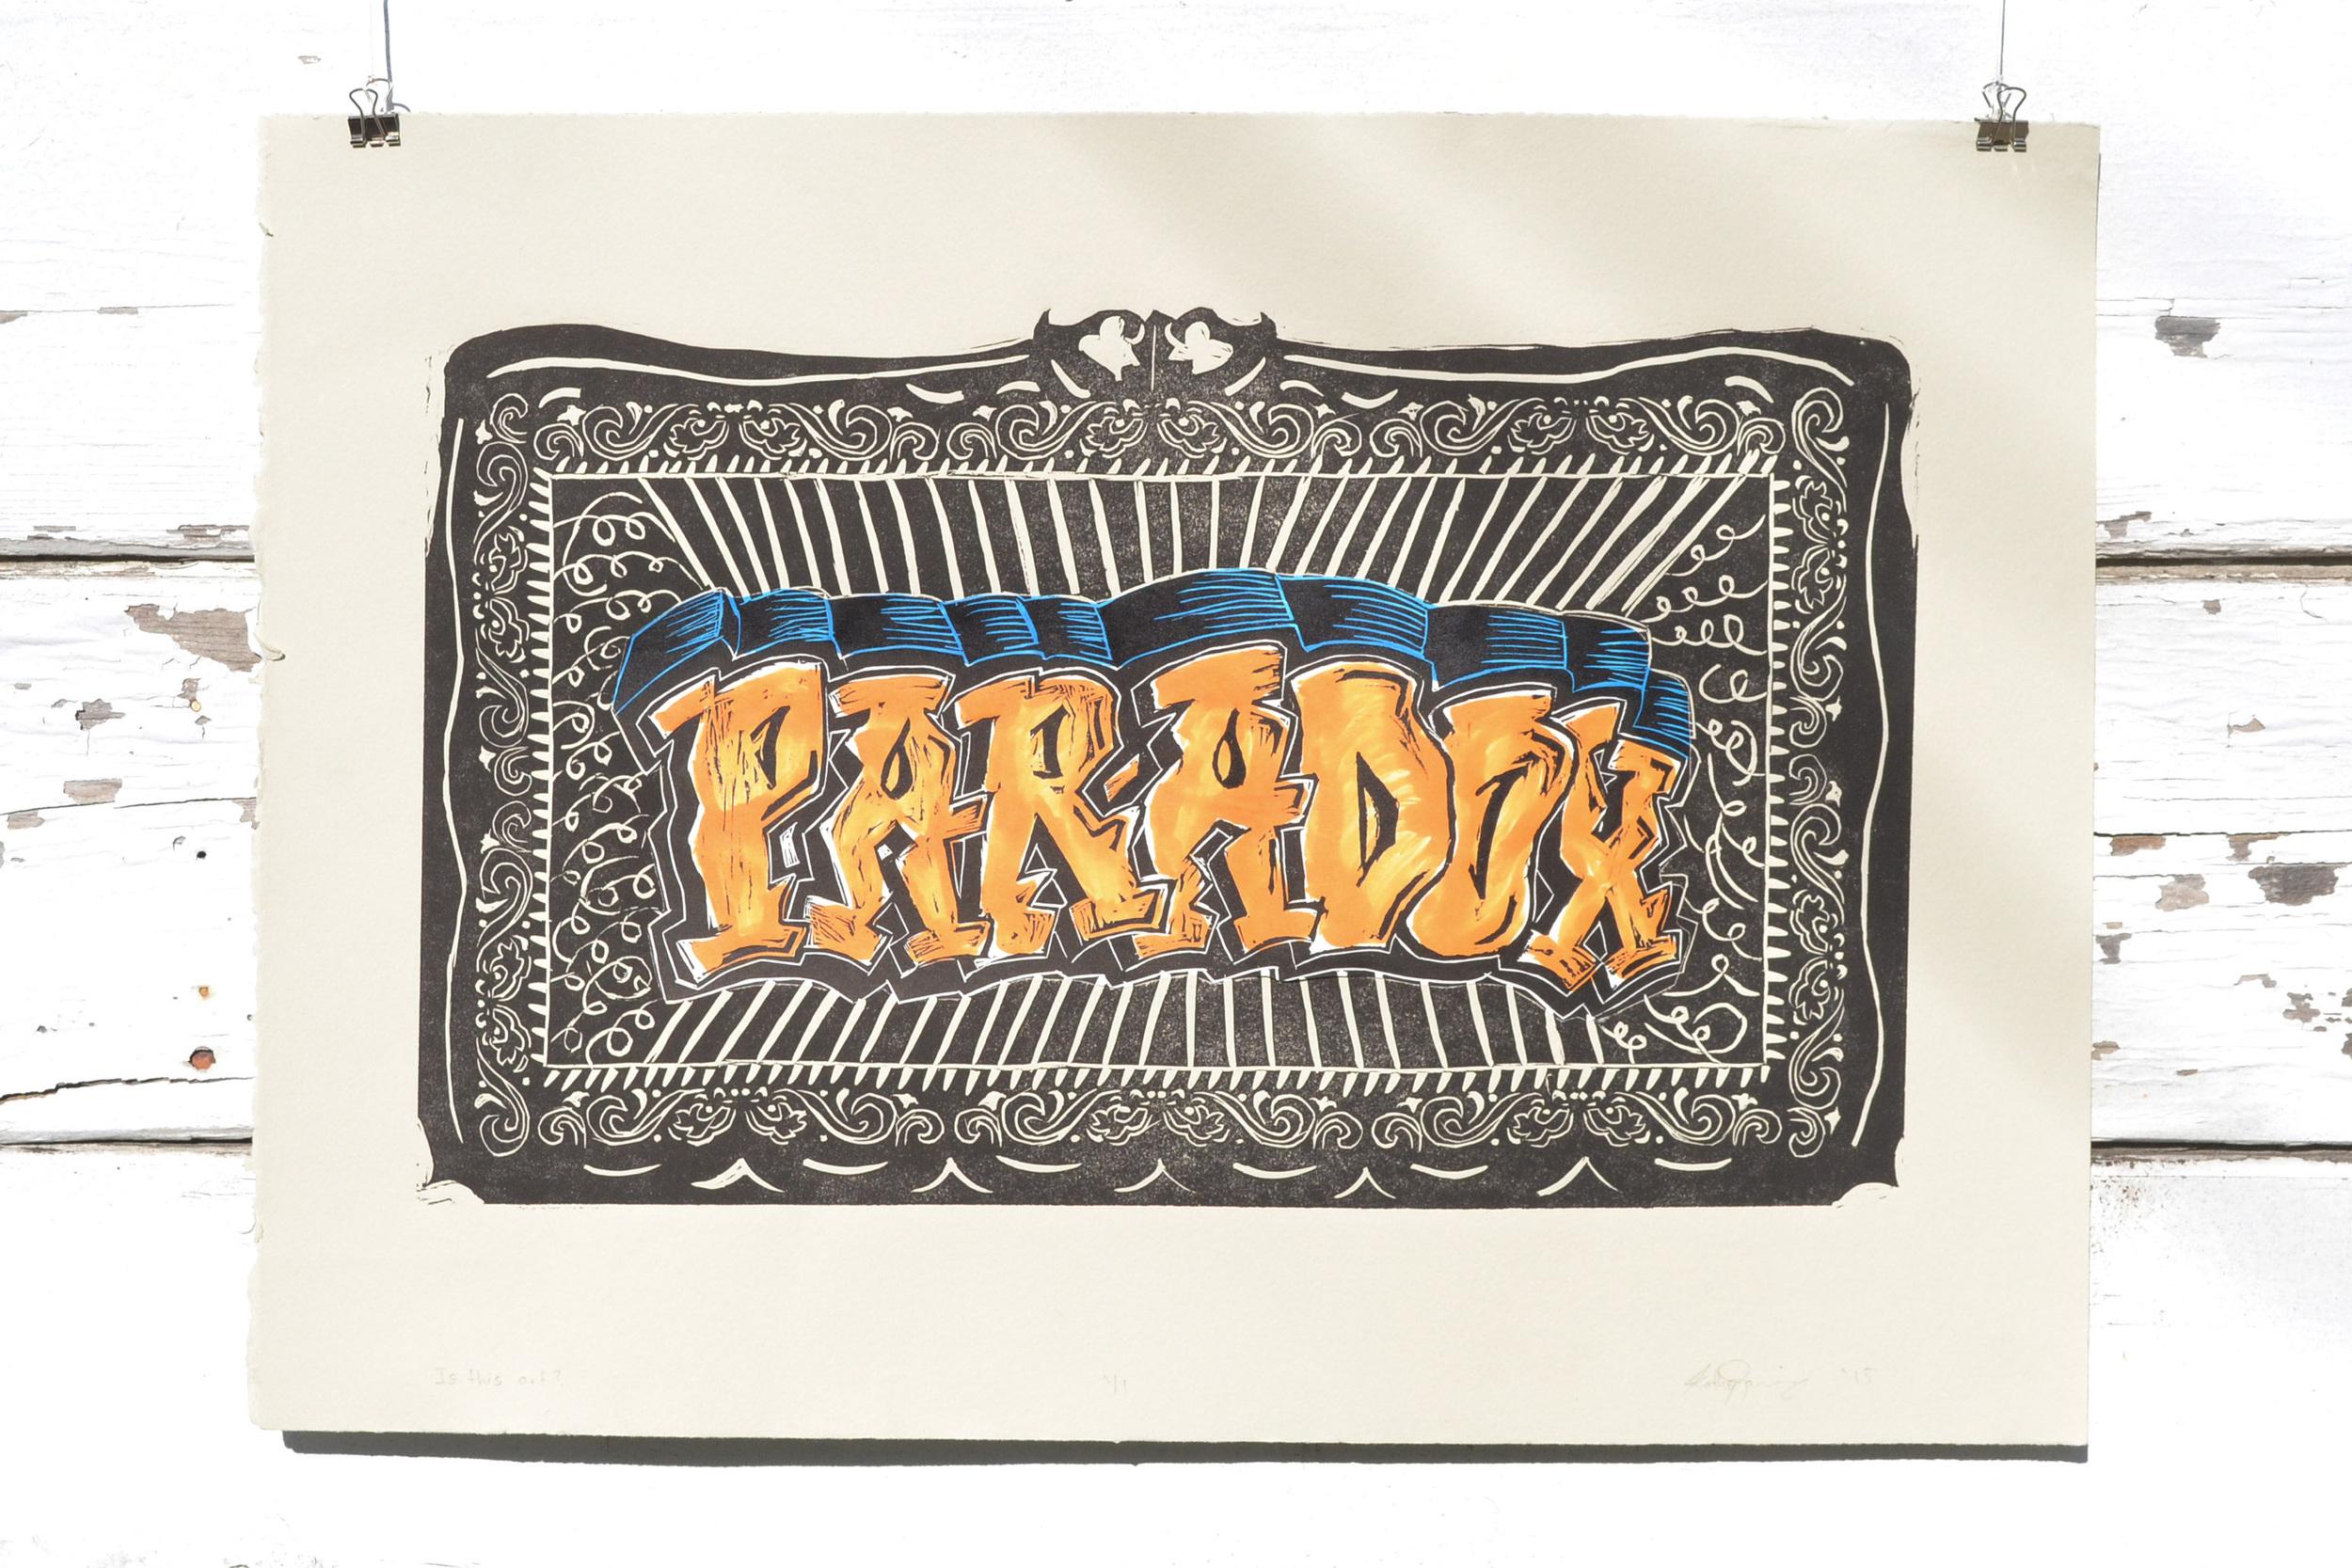 Miss-Kathy-Ramirez-Paradox-relief-print-color.jpg